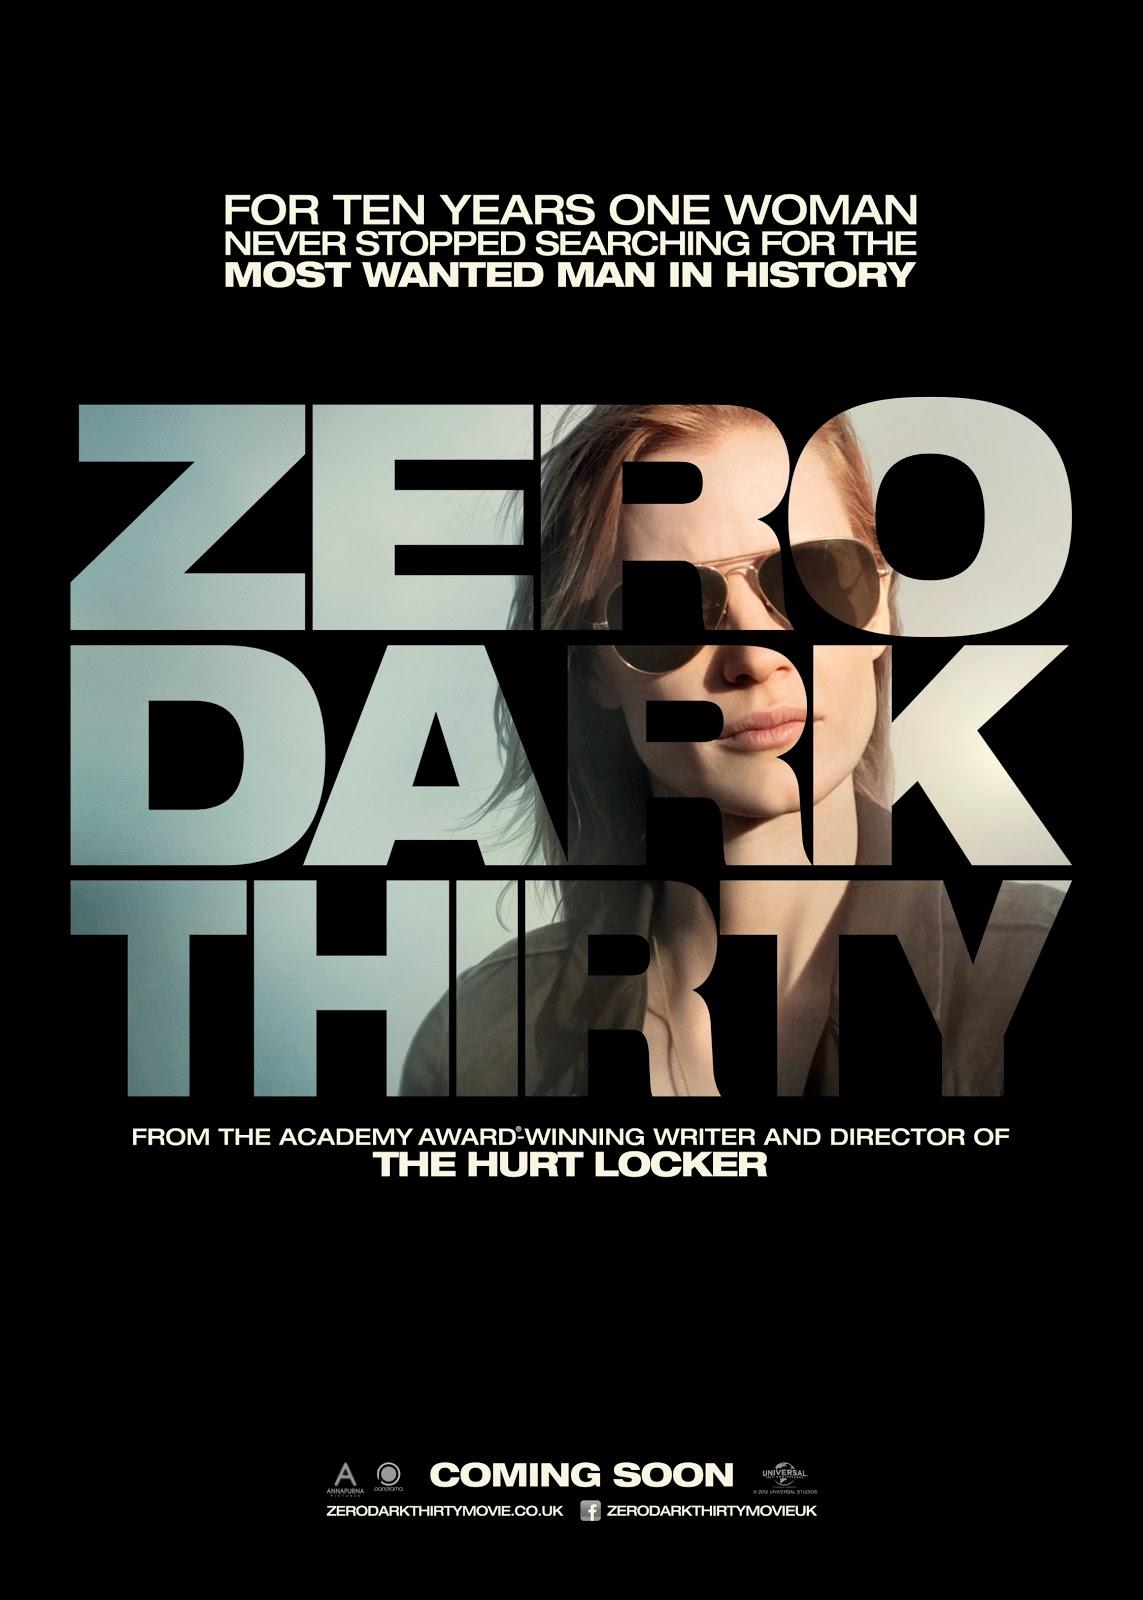 http://4.bp.blogspot.com/-_IBhAj7n4WU/UNy7FeUZrZI/AAAAAAAAOsQ/eWtFp-900_w/s1600/Zero-Dark-Thirty-Poster.jpg